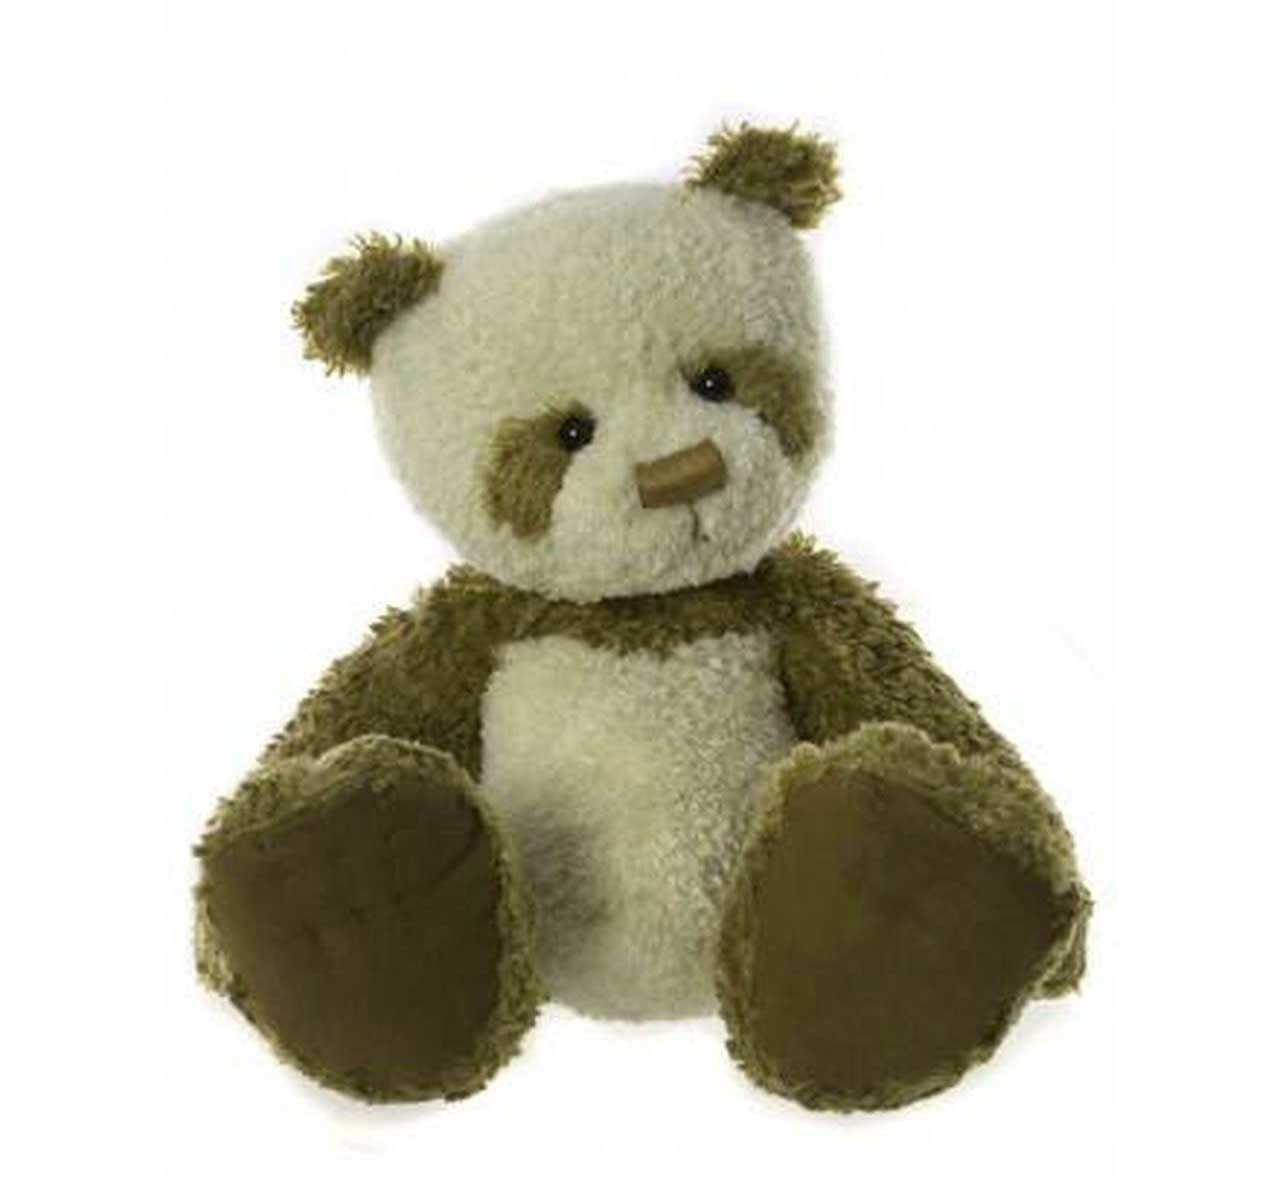 Teddy%2BBear%2BImages%2BPics%2BHD17